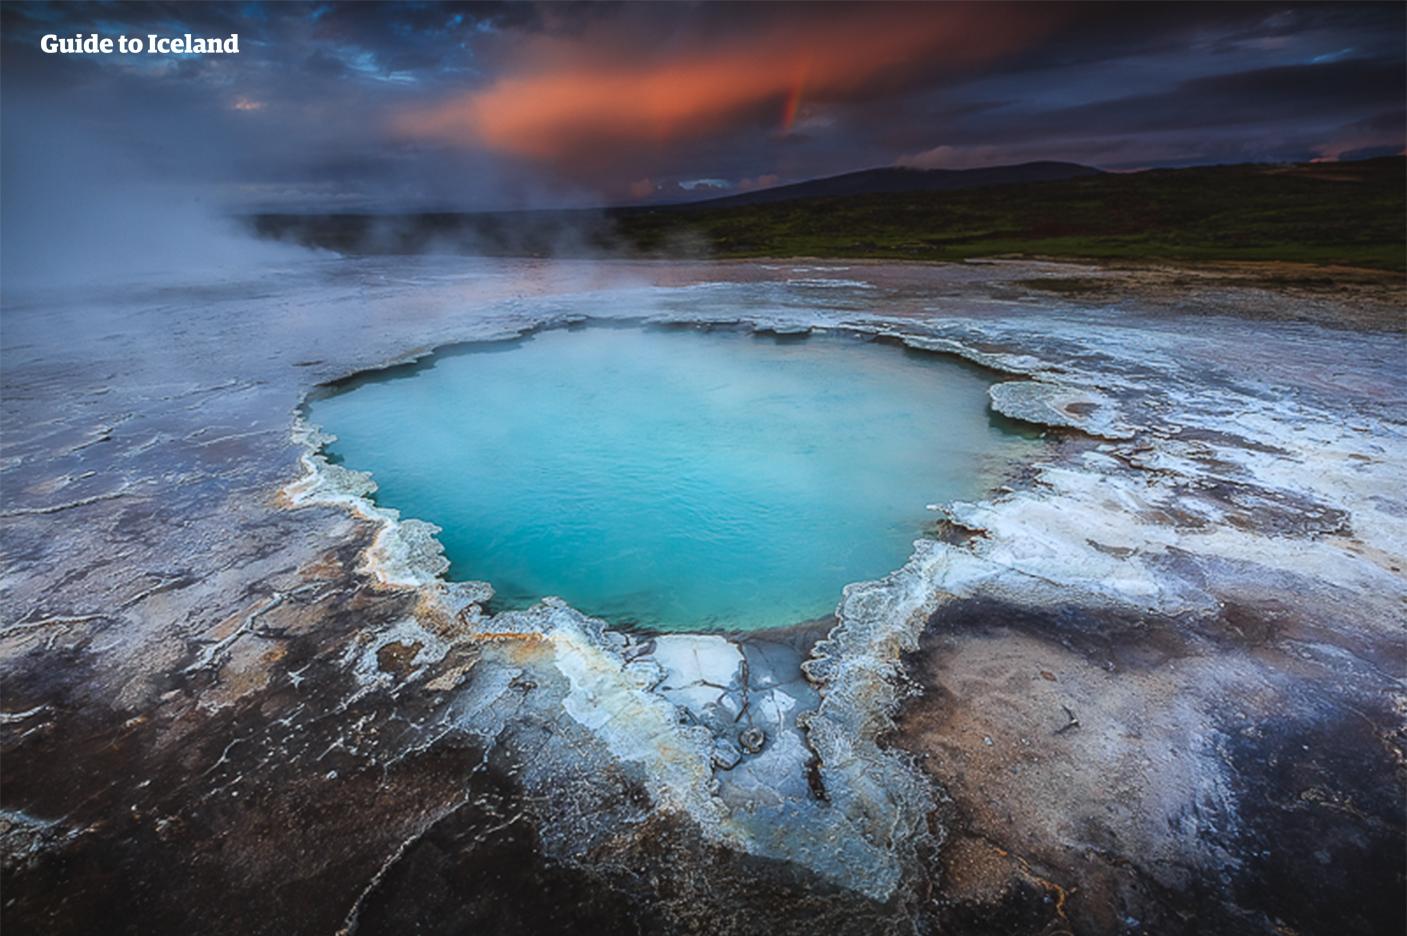 Gorące źródła wanna z hydromasażem